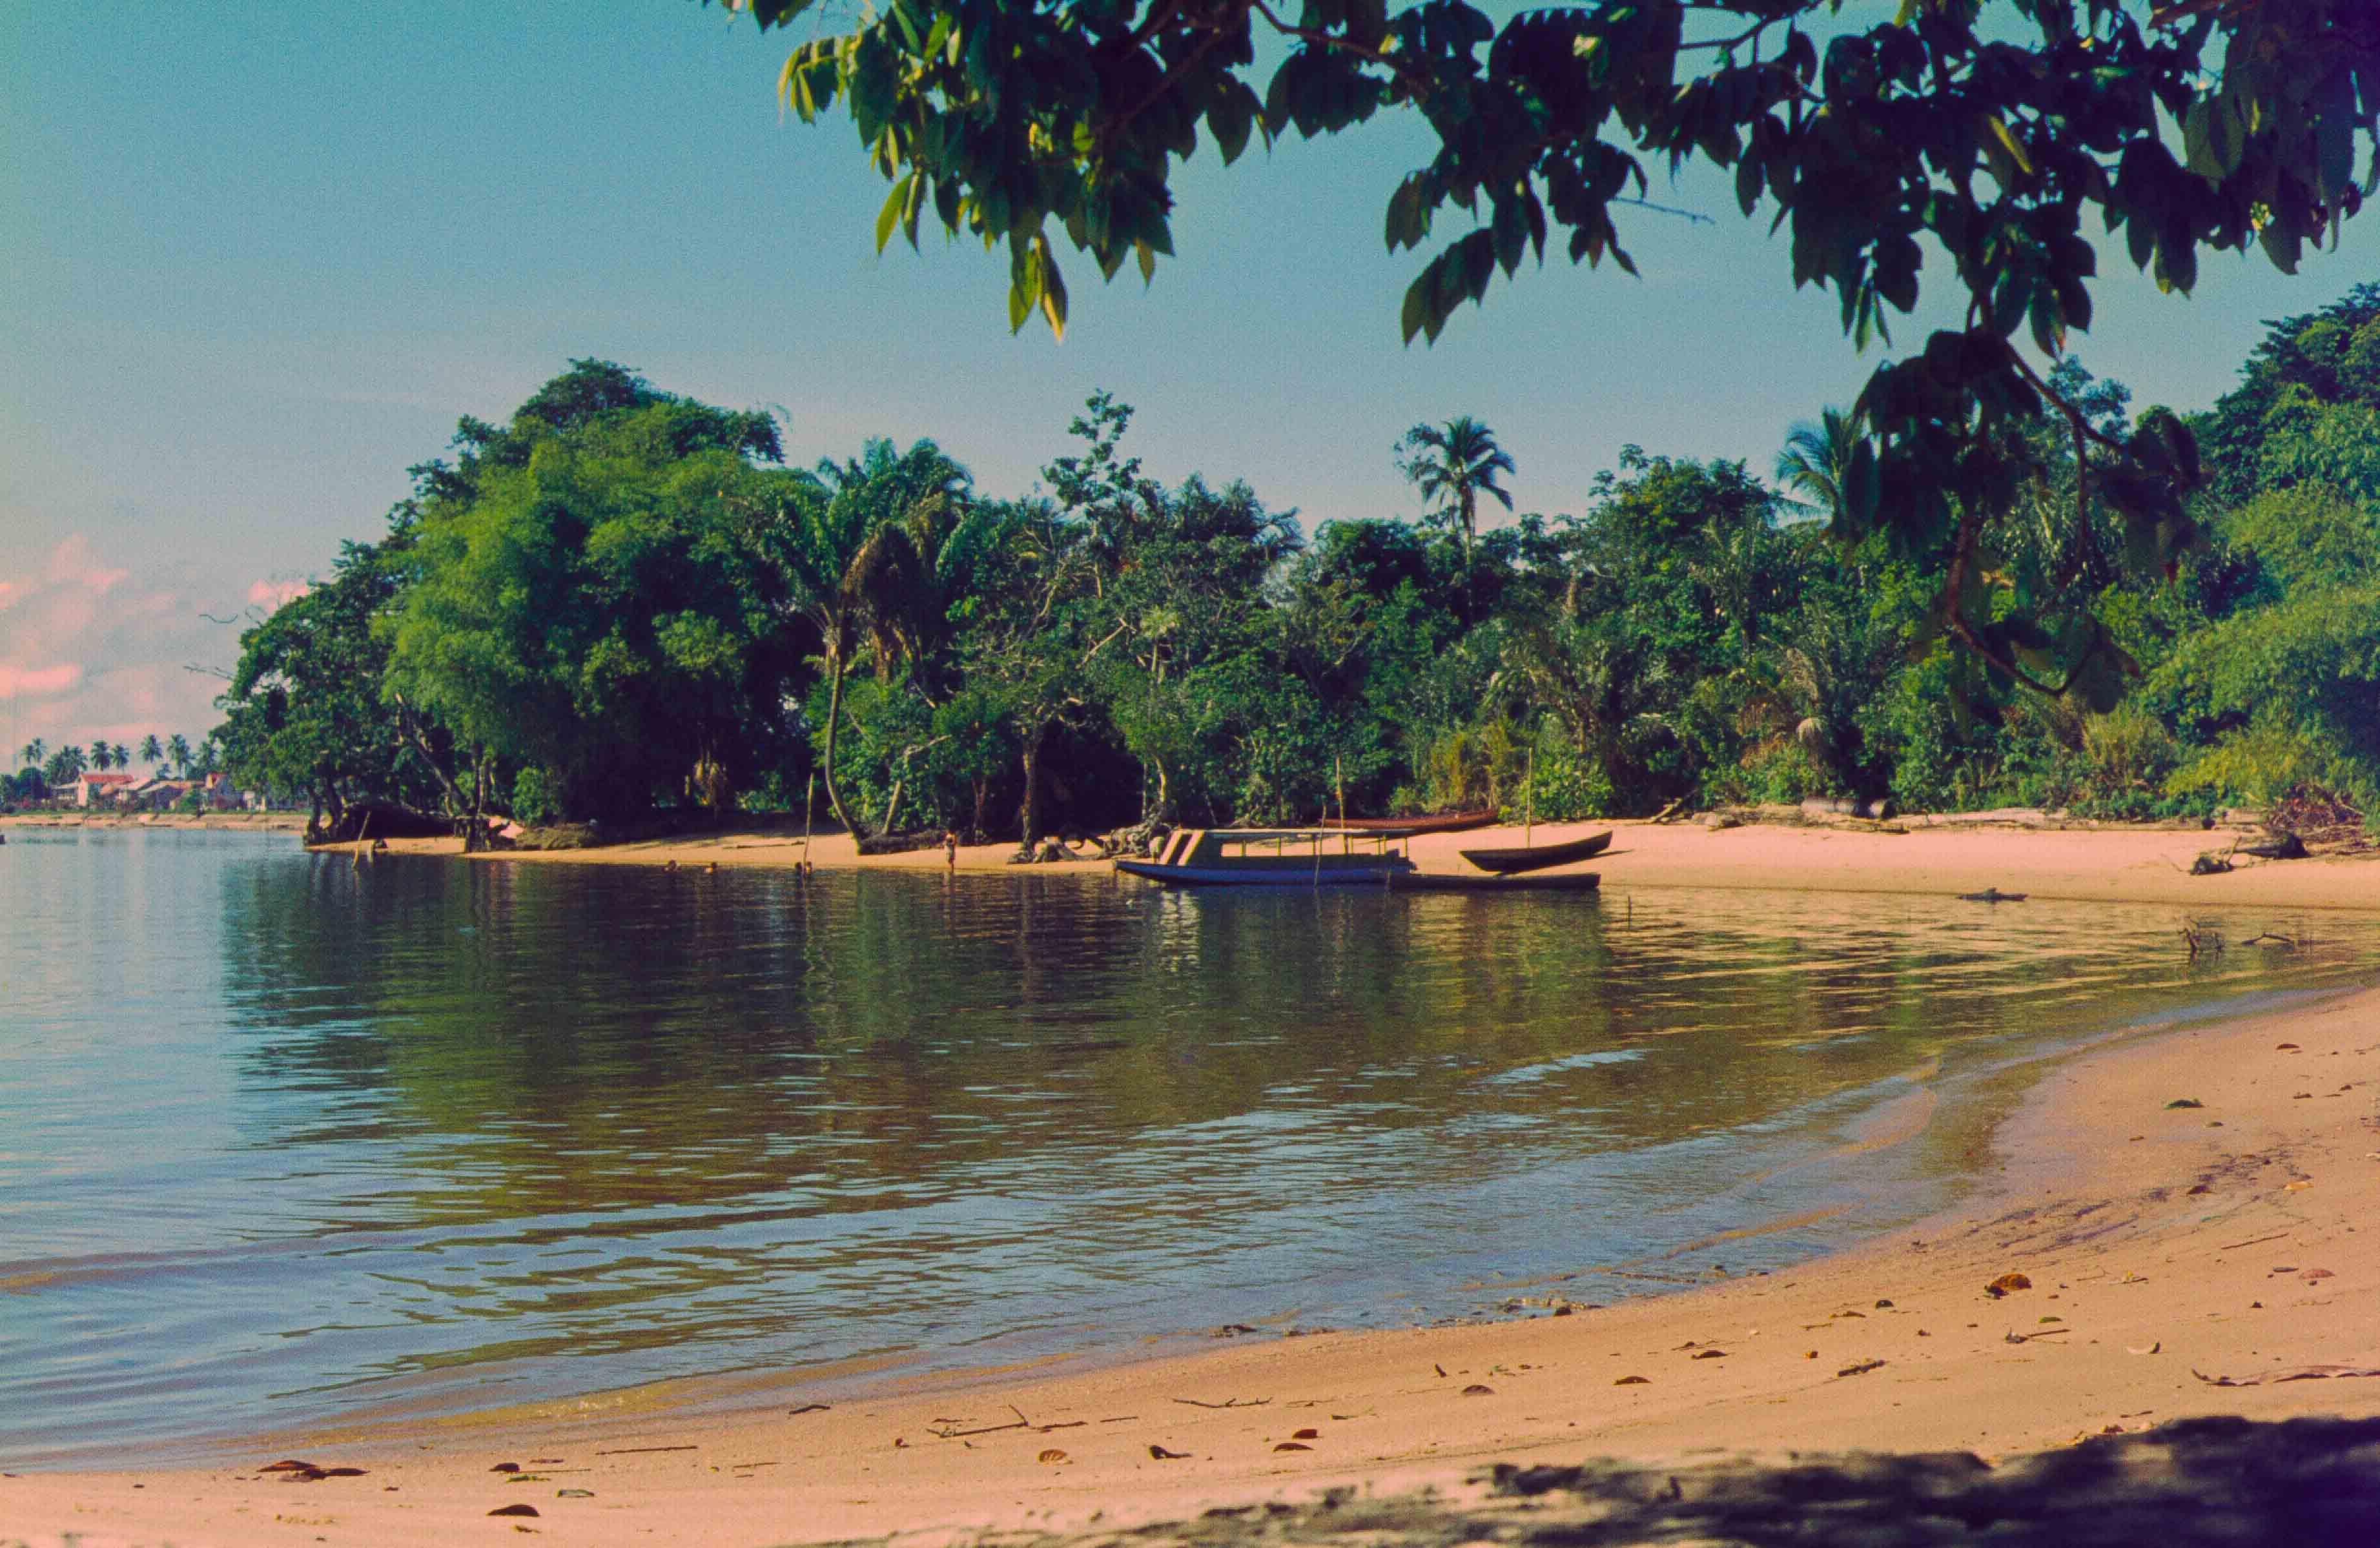 390. Suriname